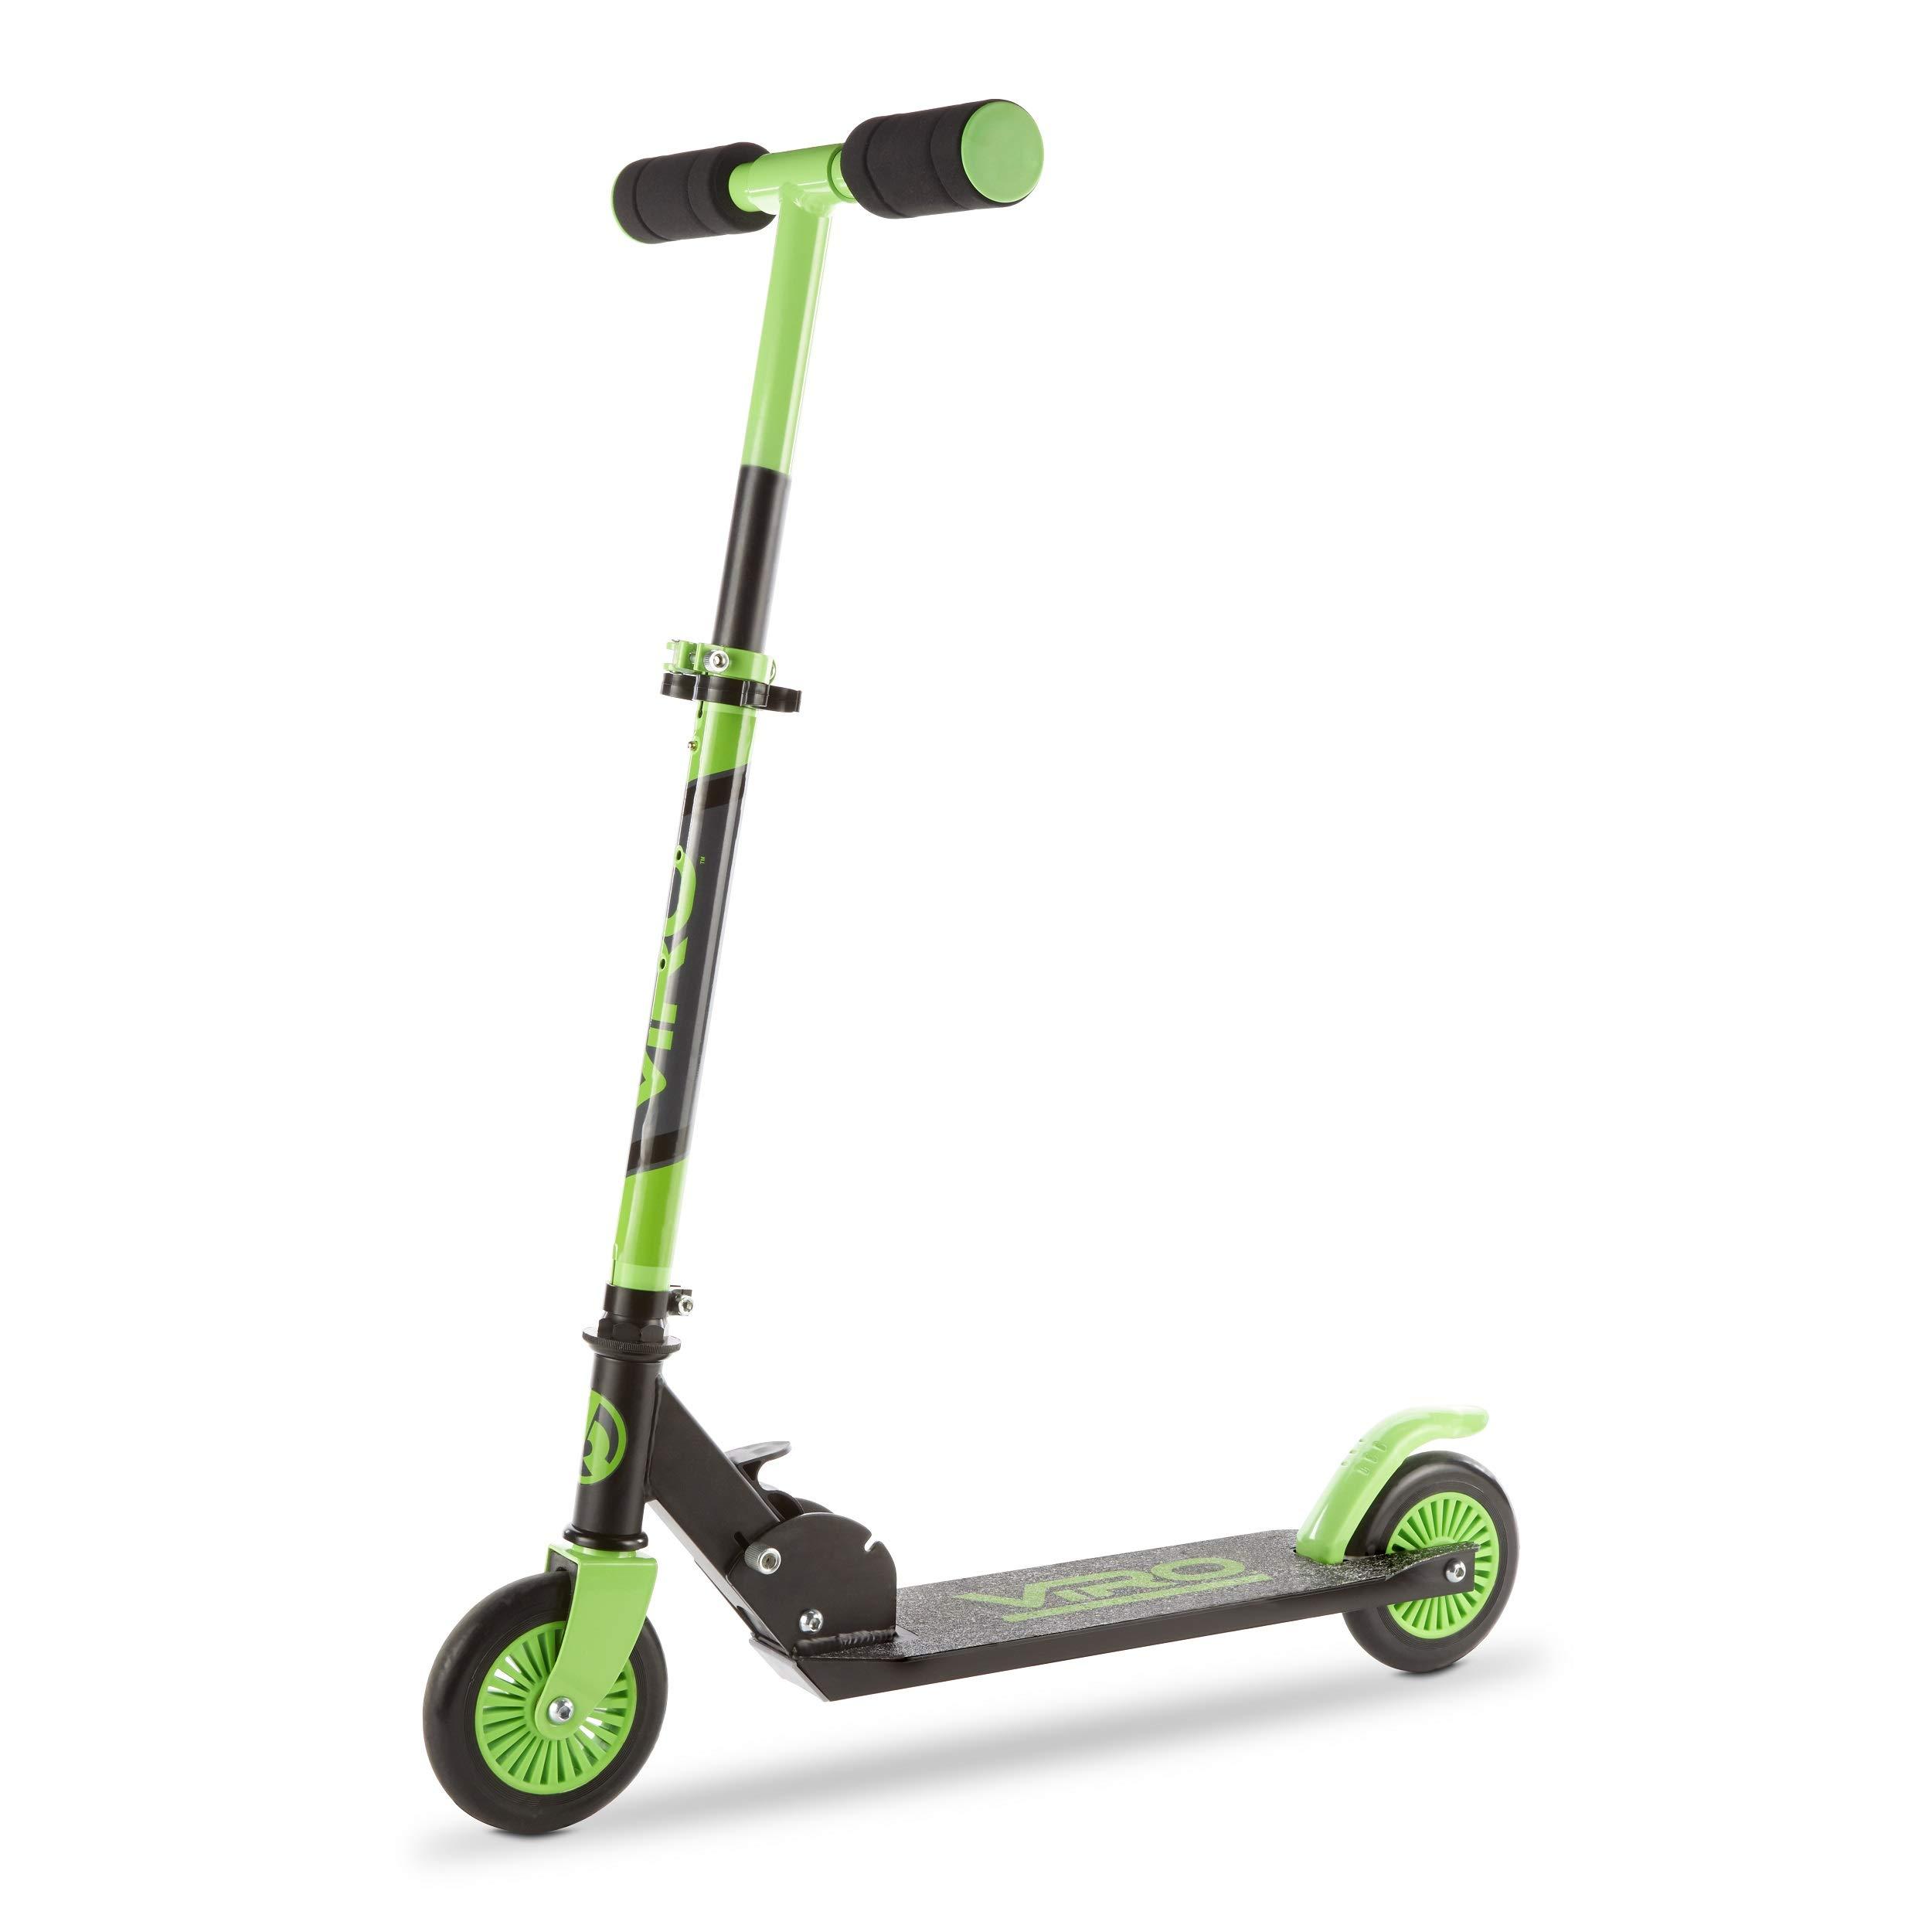 Viro Rides 130 Fast Break Kick Scooter